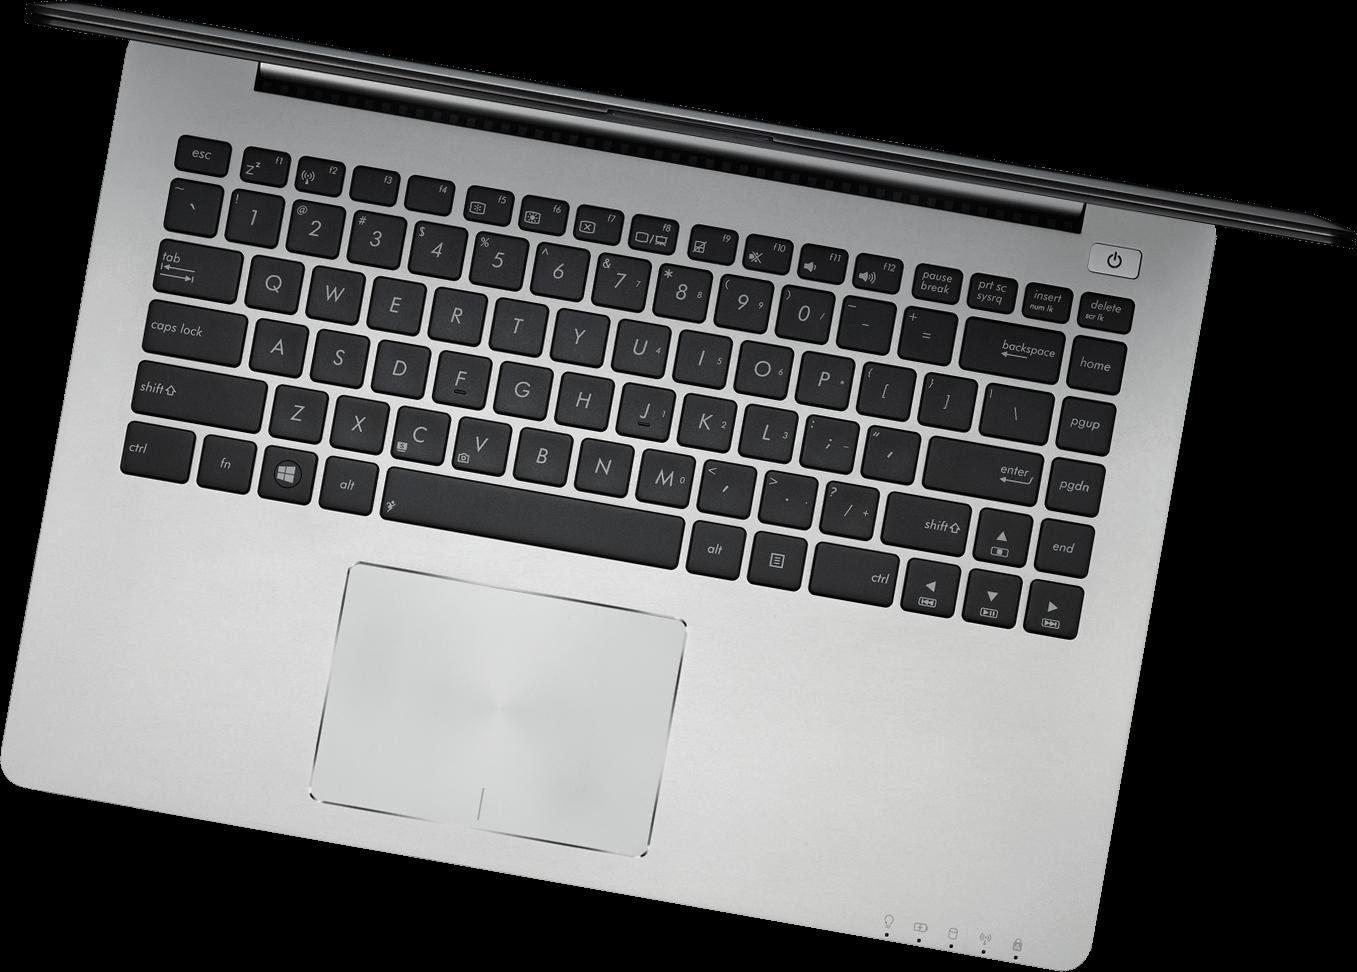 ASUS VivoBook S301LA Keyboard Driver PC